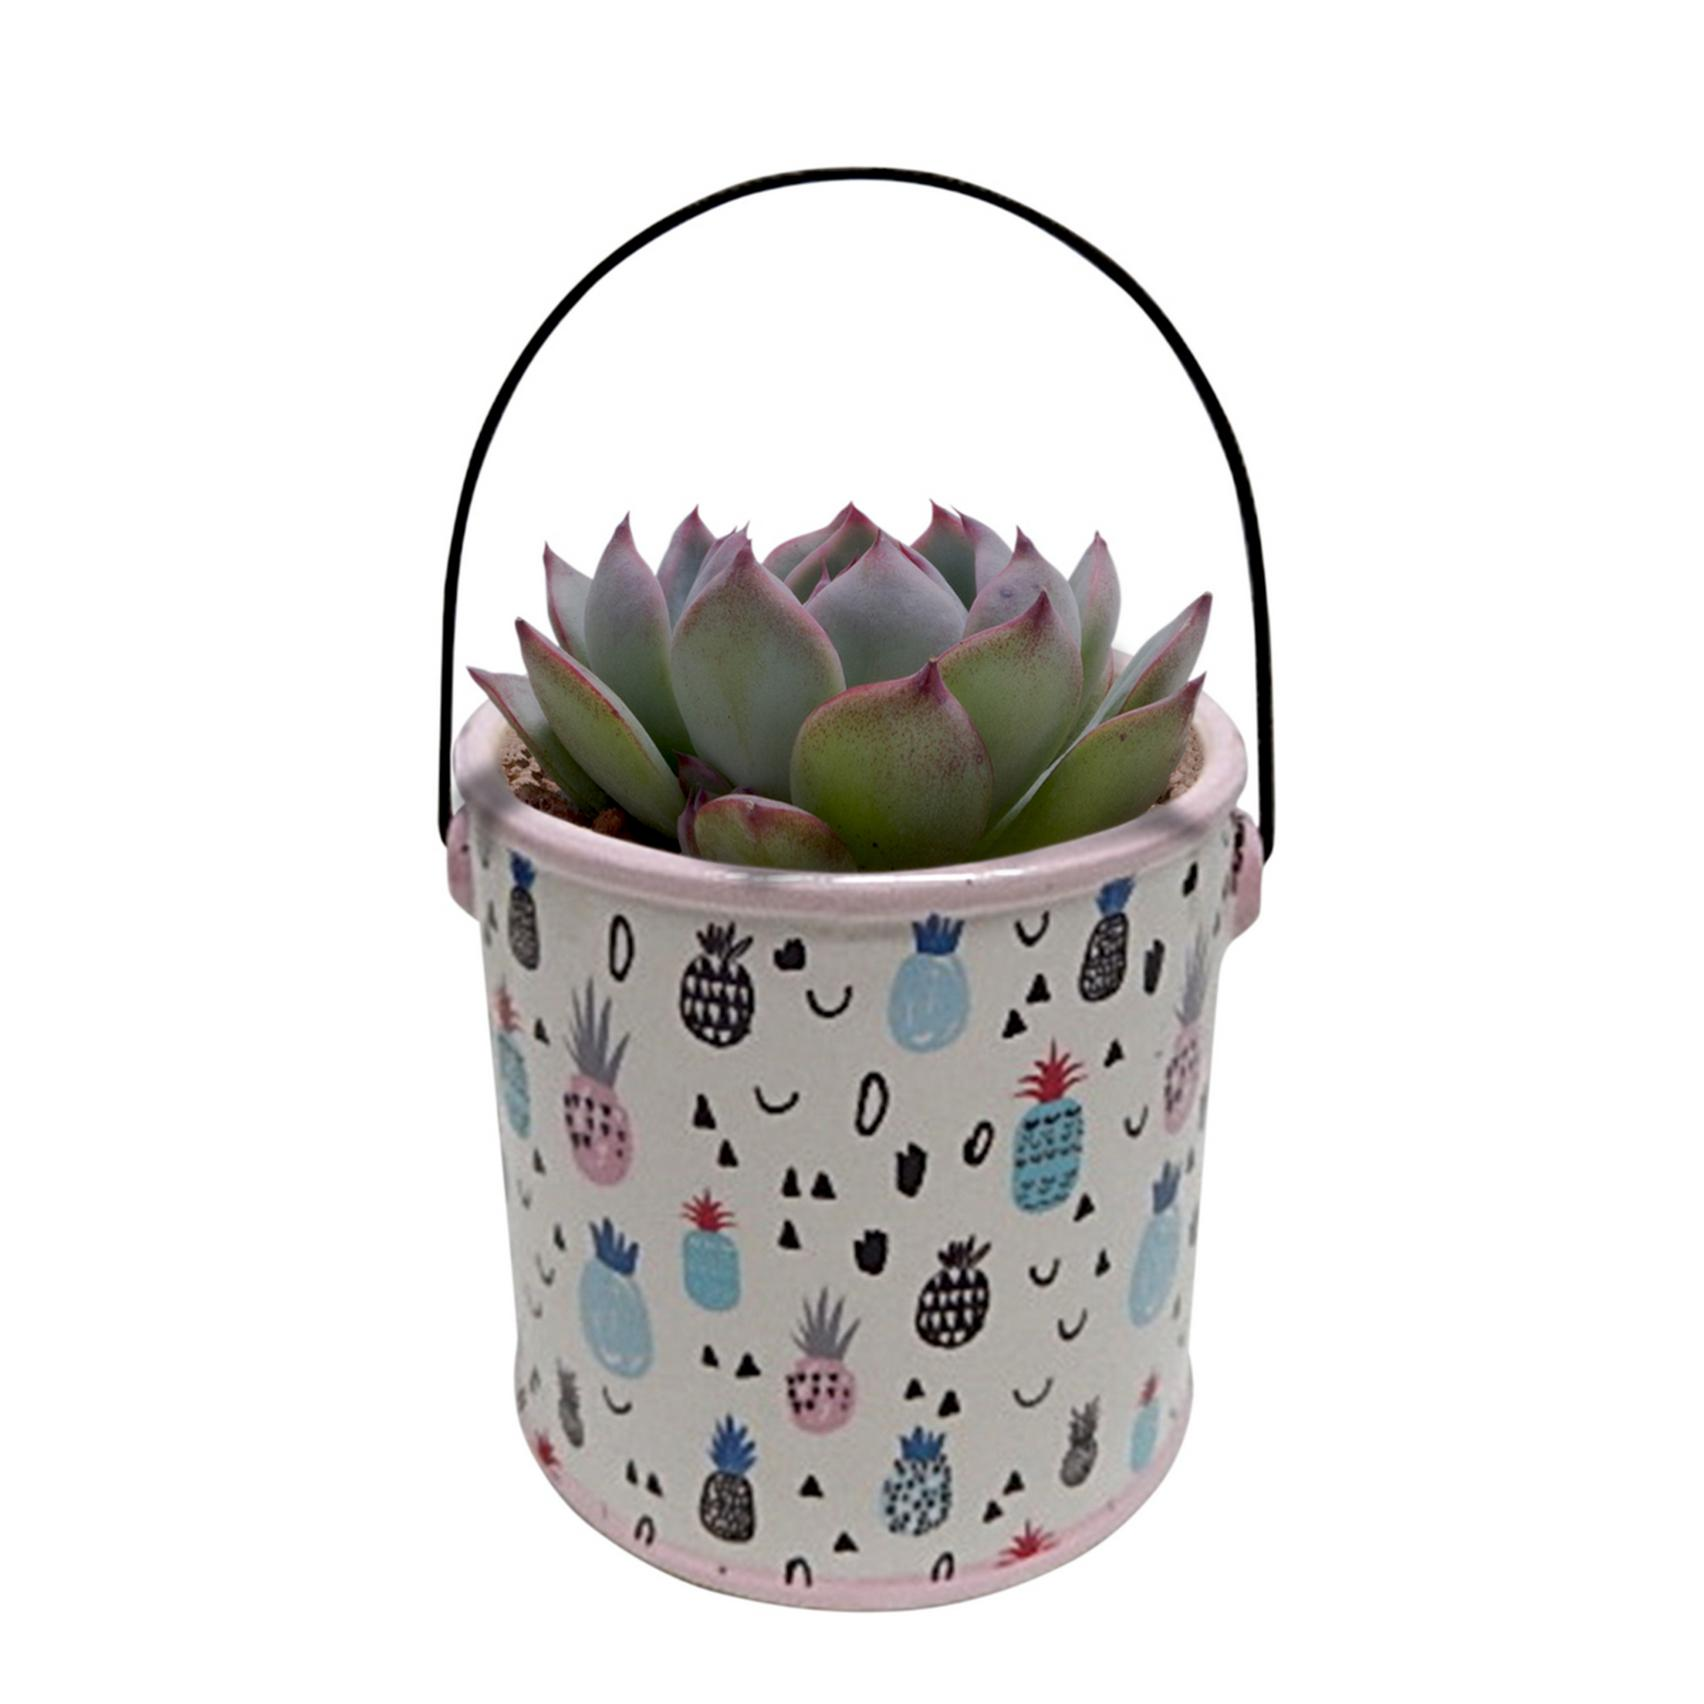 Vaso Cerâmica Drawn Pineapple Can Fd Branco 12,5 X 12 X 12 Cm - Urban